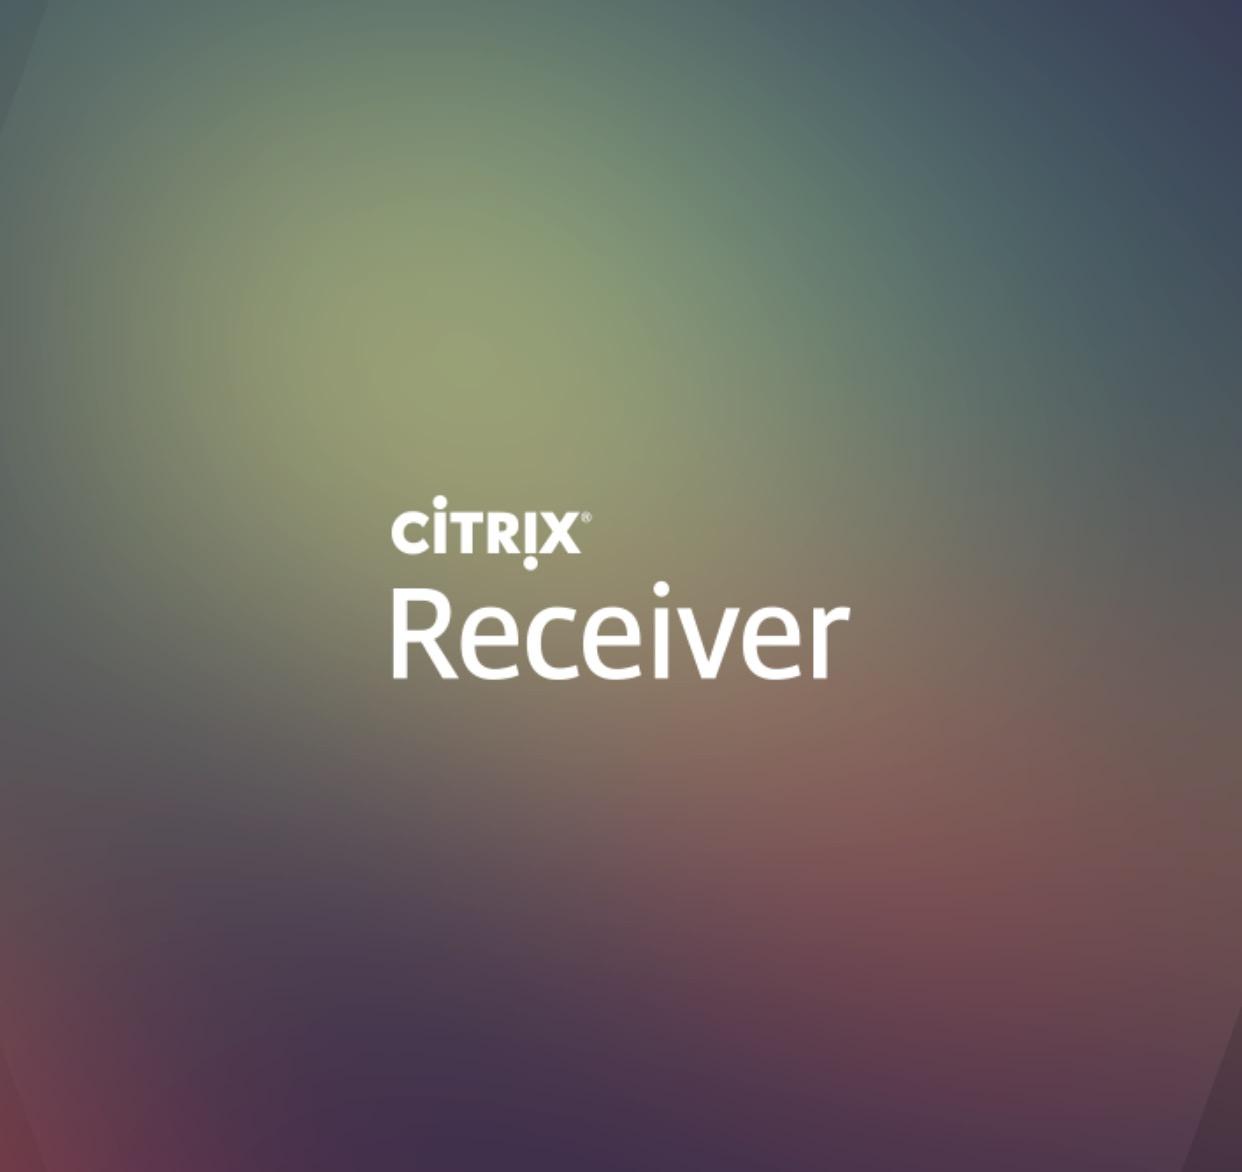 This tweak bypasses jailbreak detection in the Citrix Receiver app